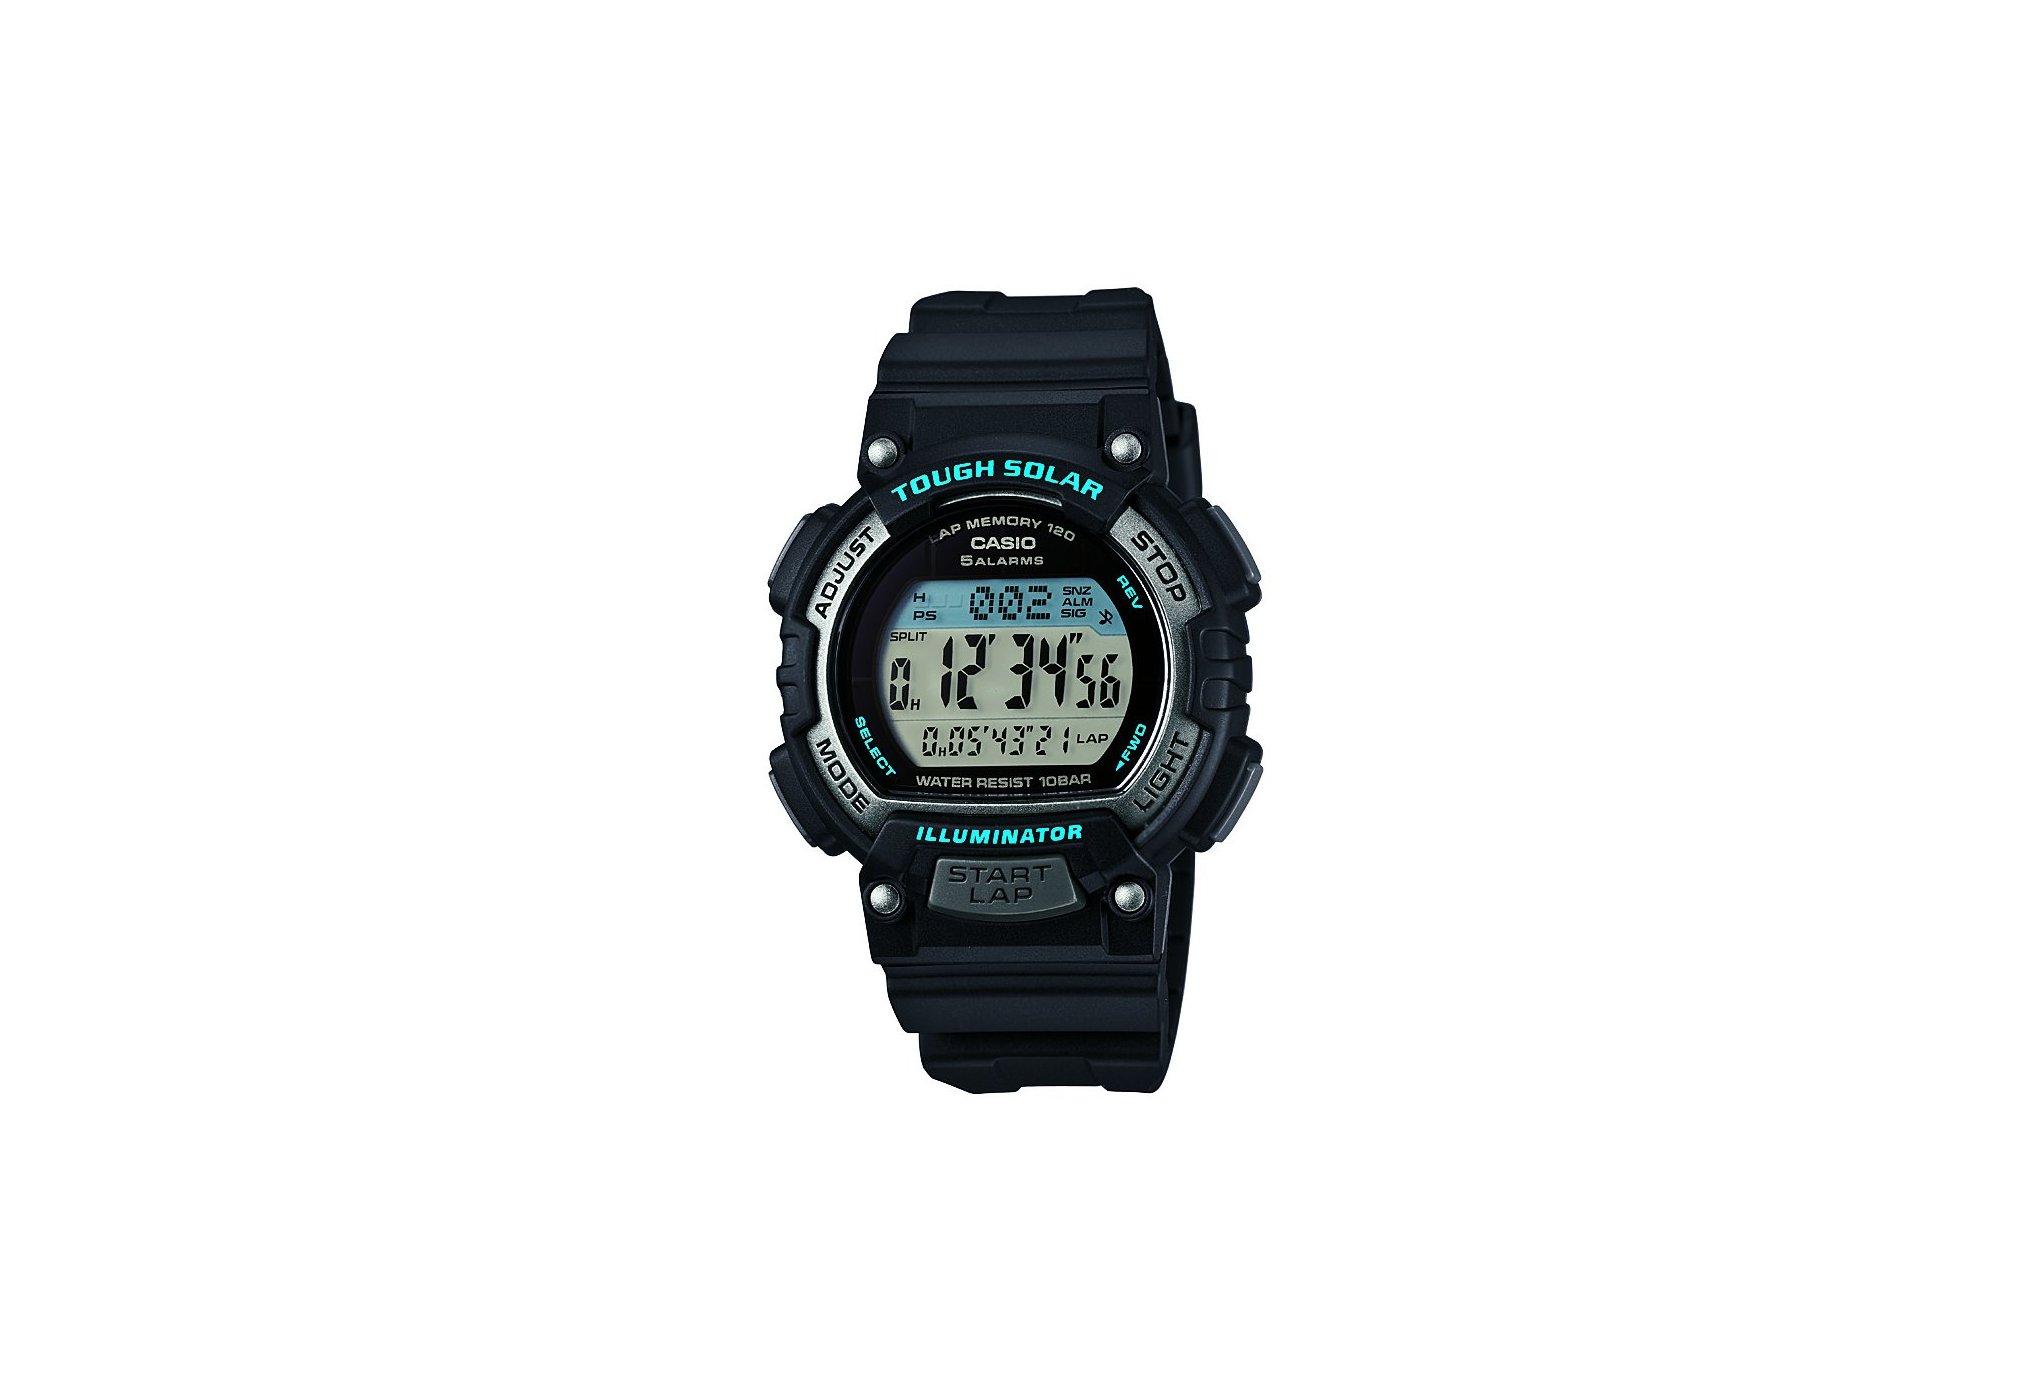 Casio Stl-S300h montres de sport